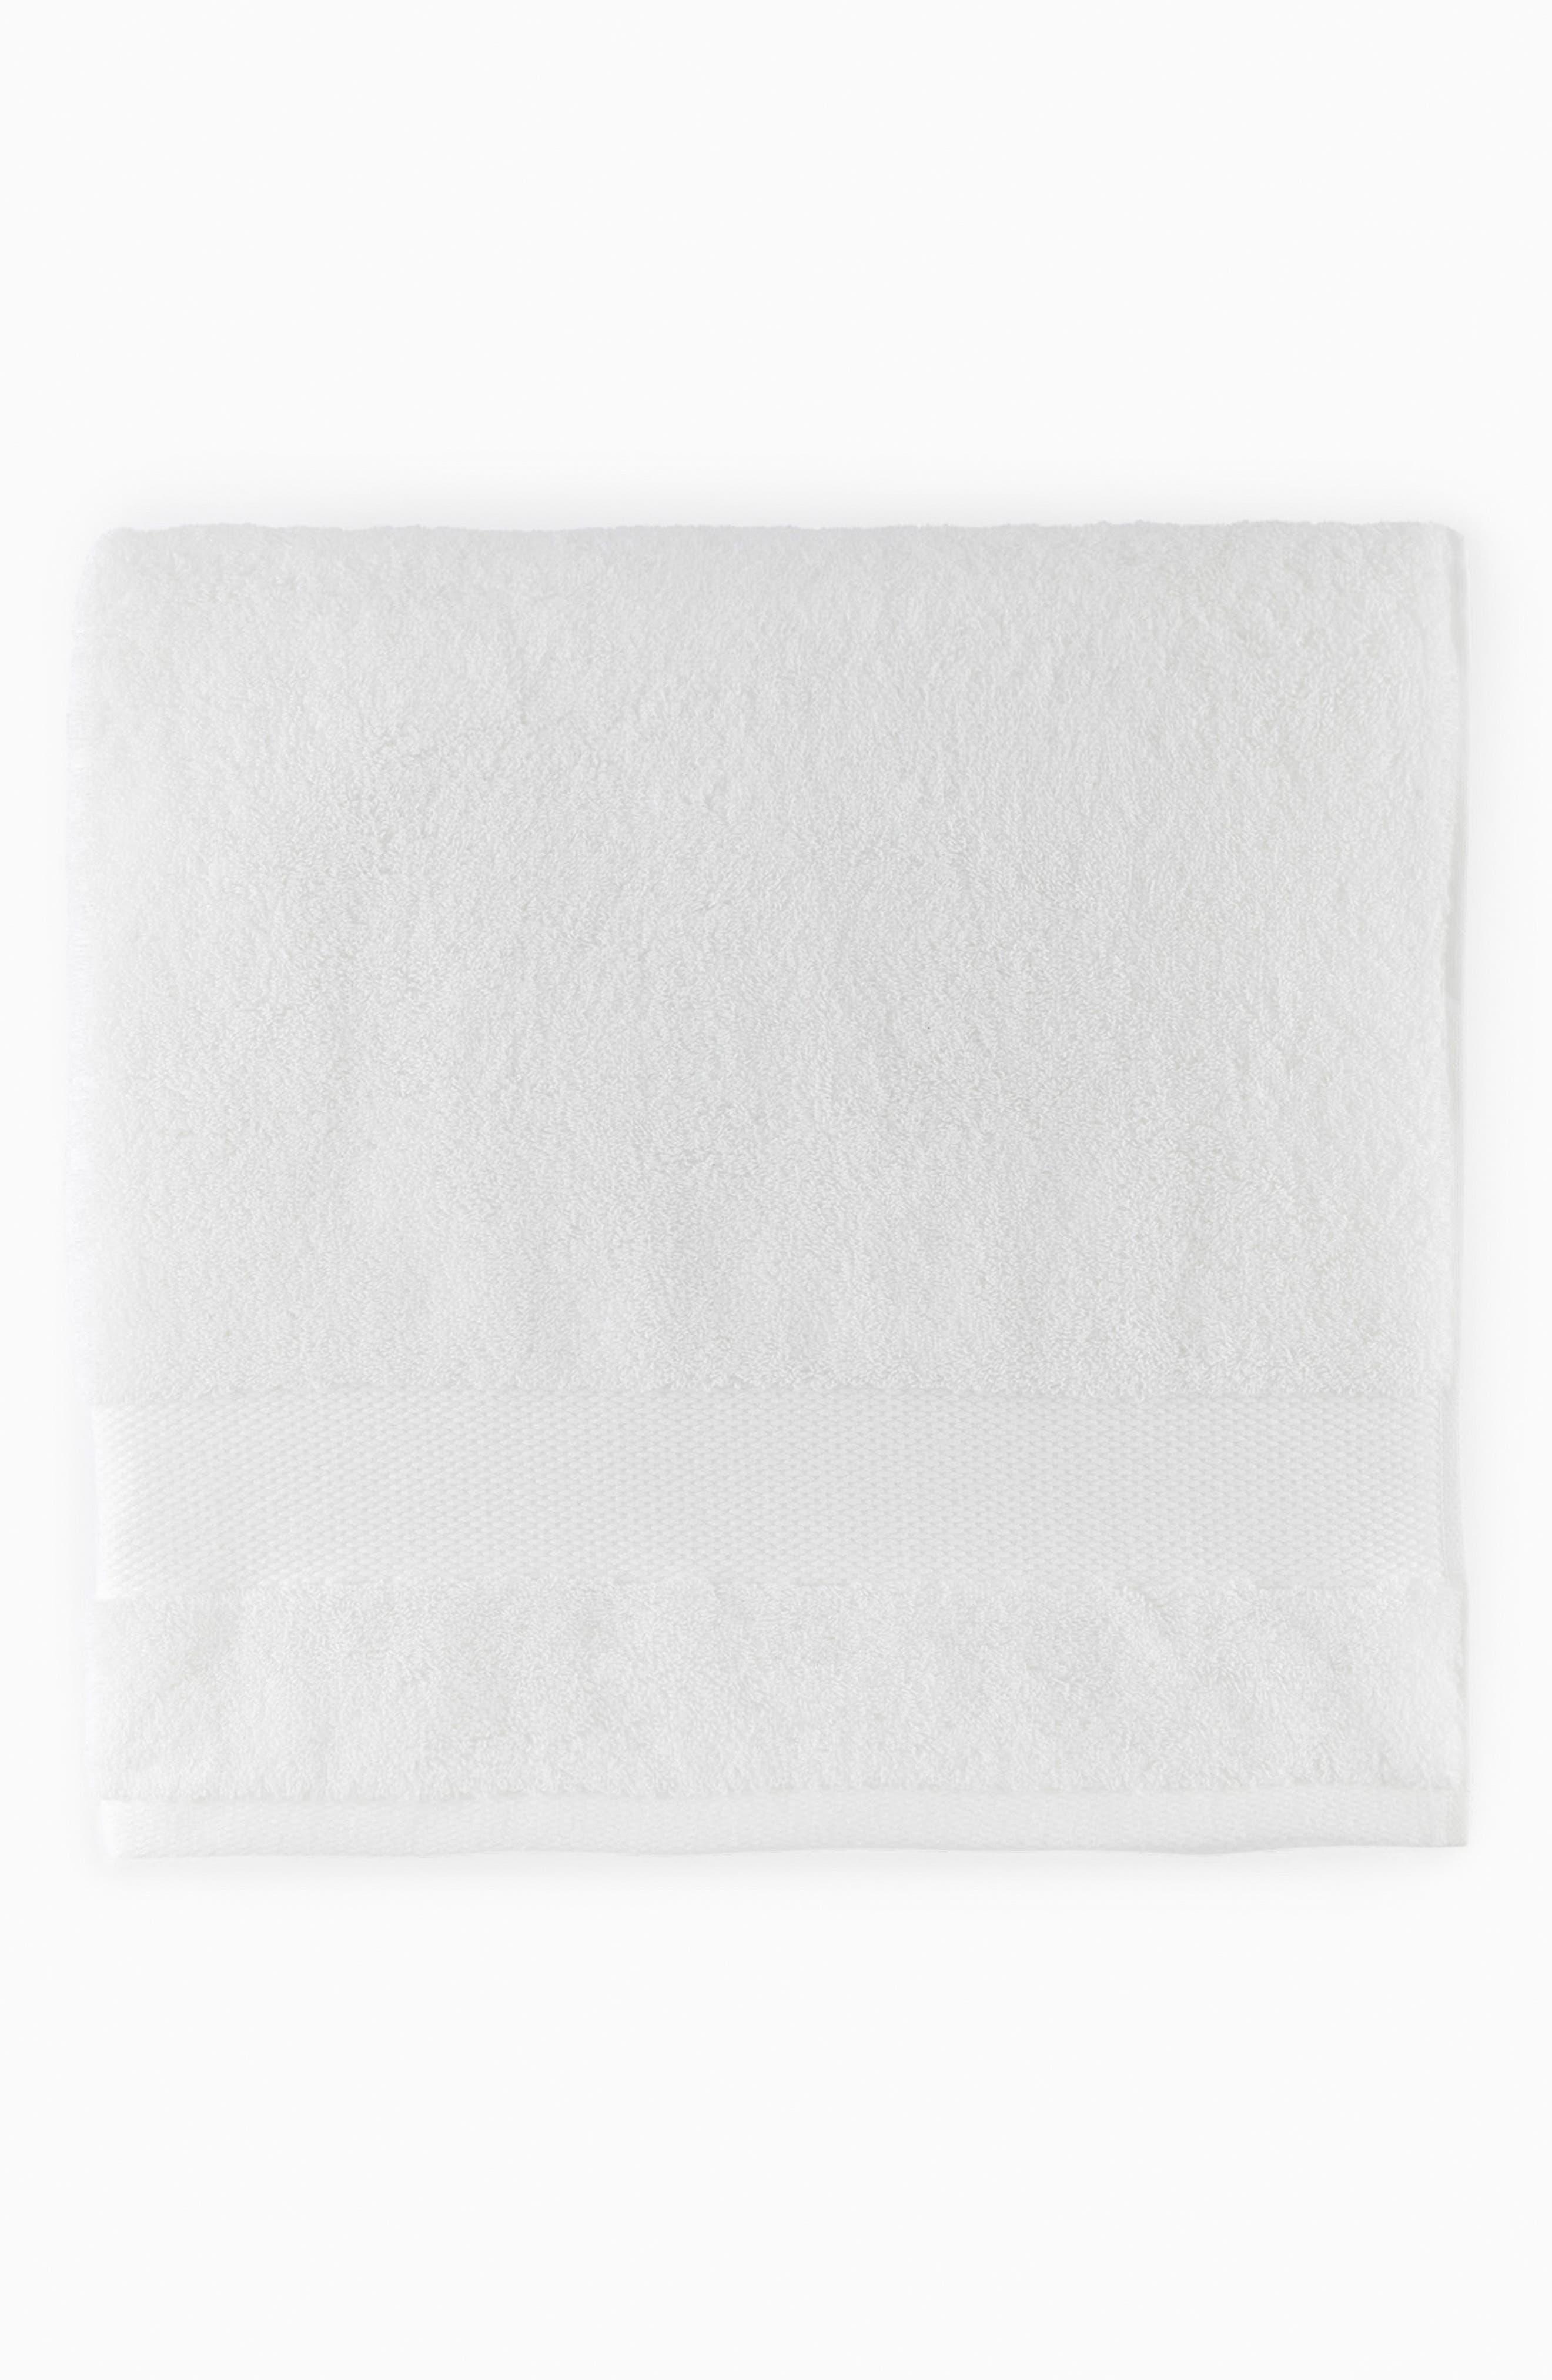 Bello Tip Towel,                         Main,                         color, 100